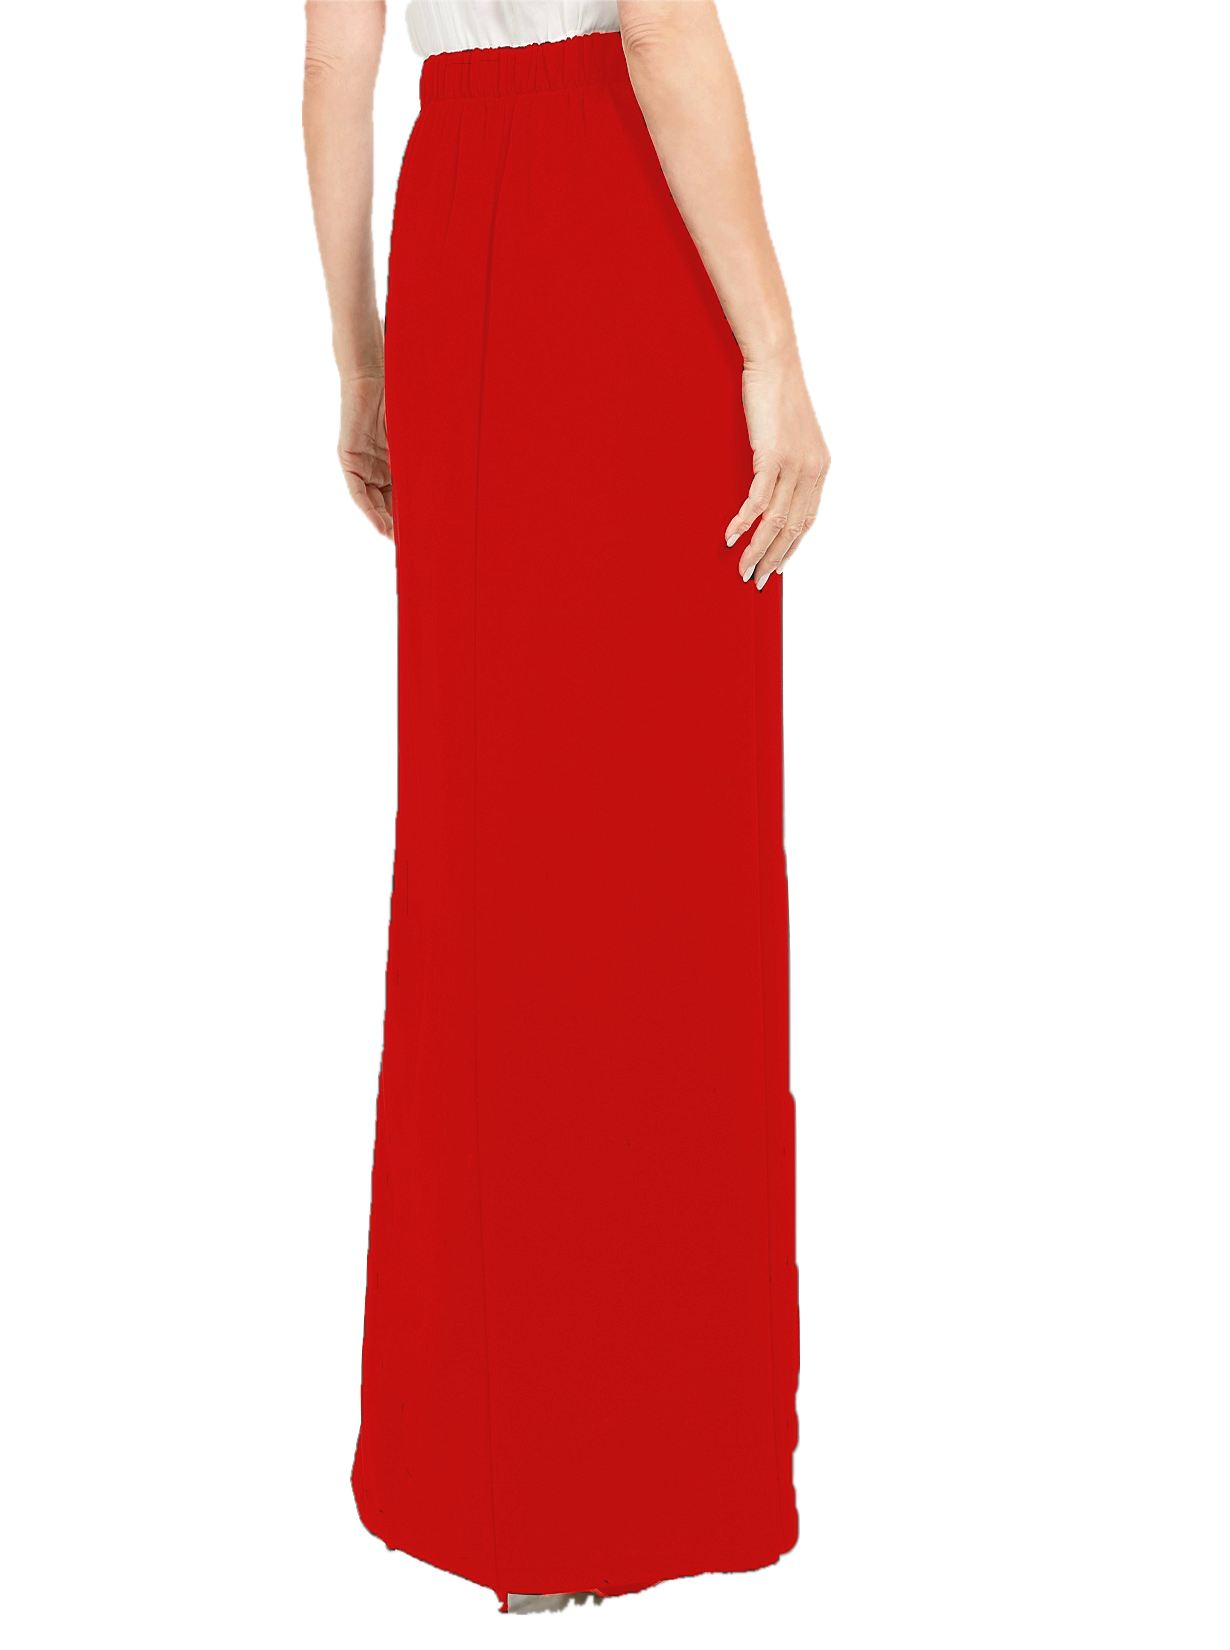 Ankle Length Side Slit Pencil Skirt in Red